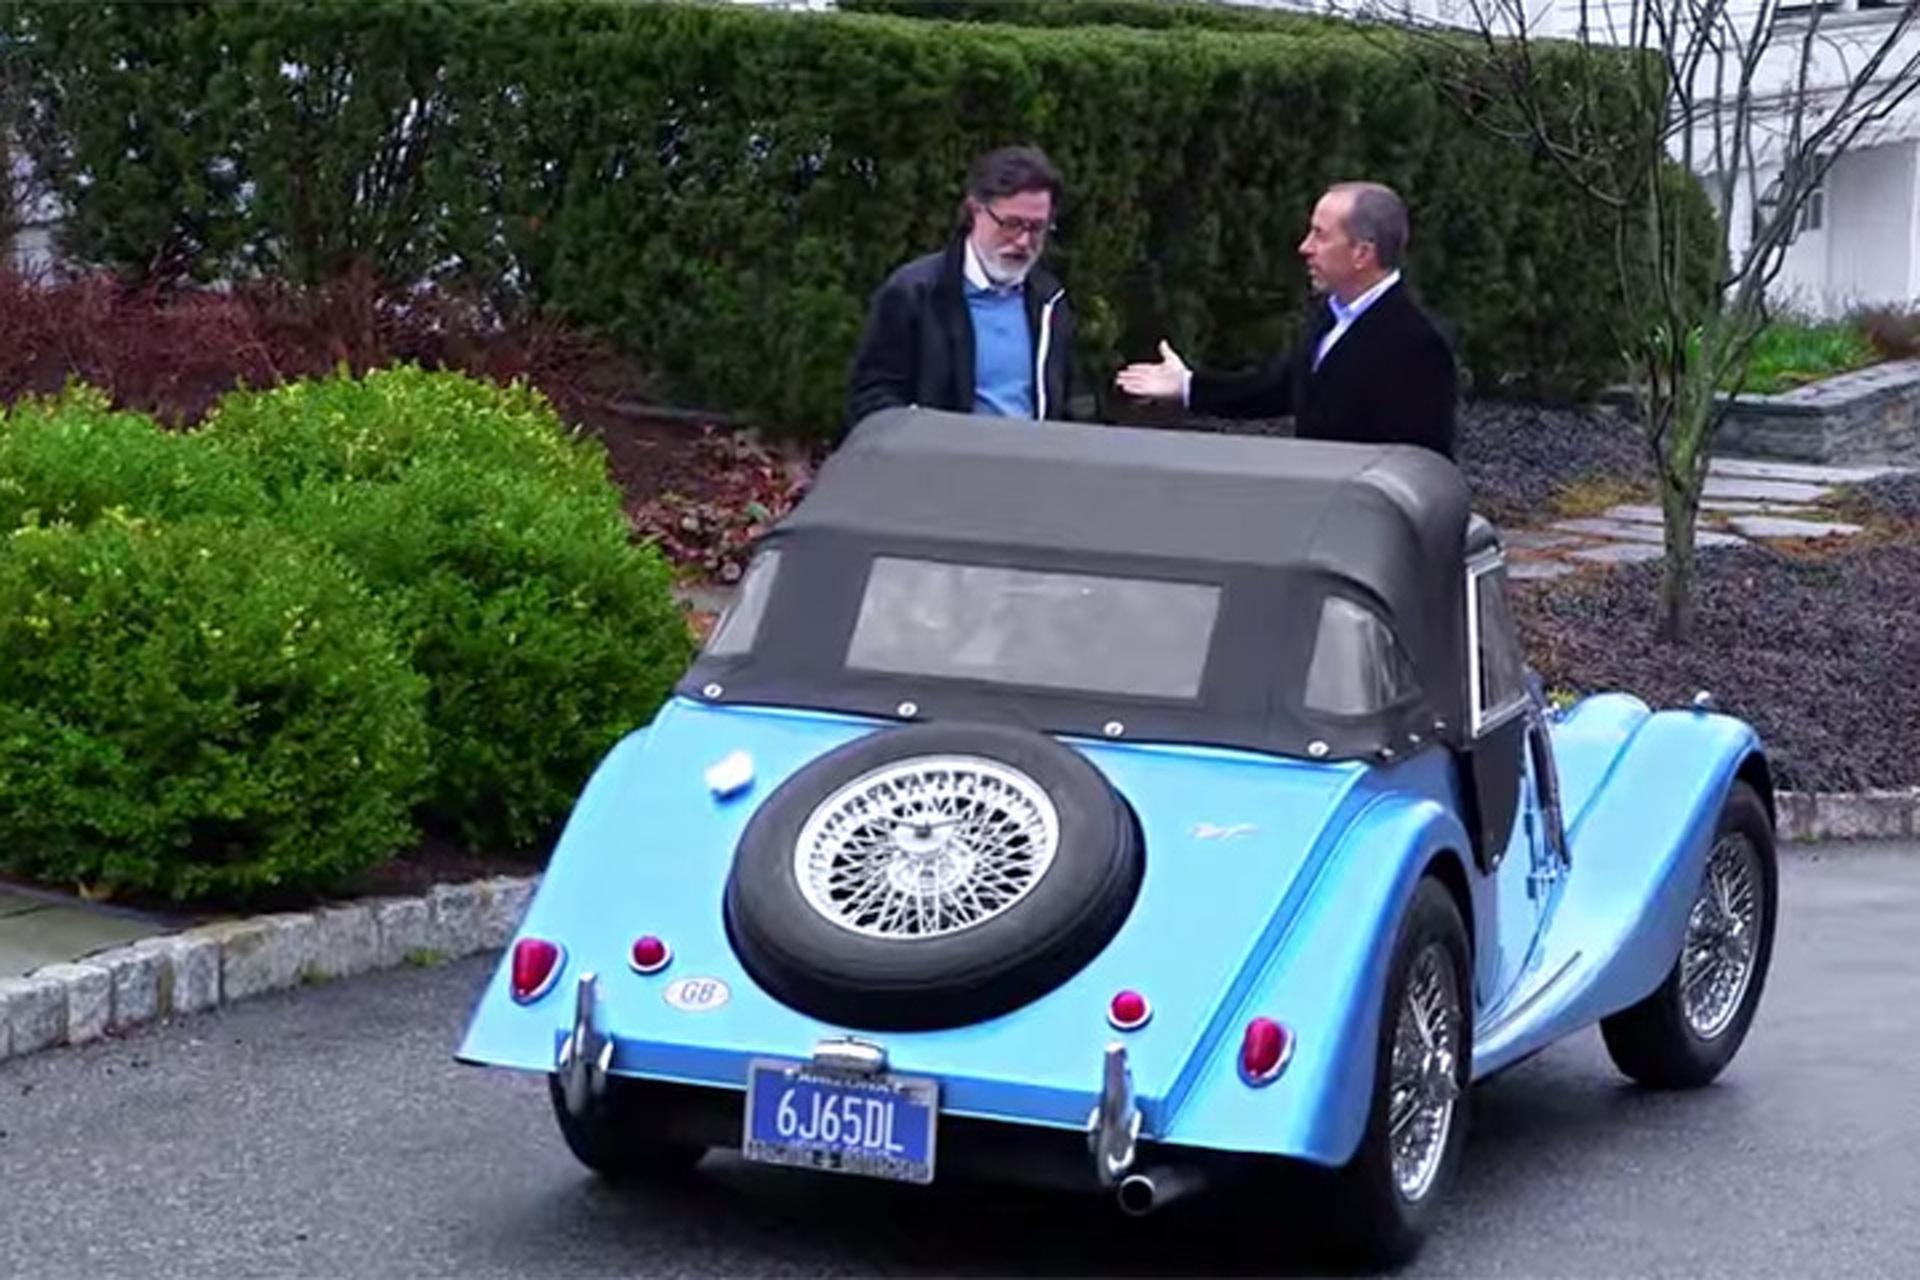 Julia Louis-Dreyfus, Stephen Colbert Entertain Seinfeld in 'Comedians in Cars Getting Coffee' Season 6